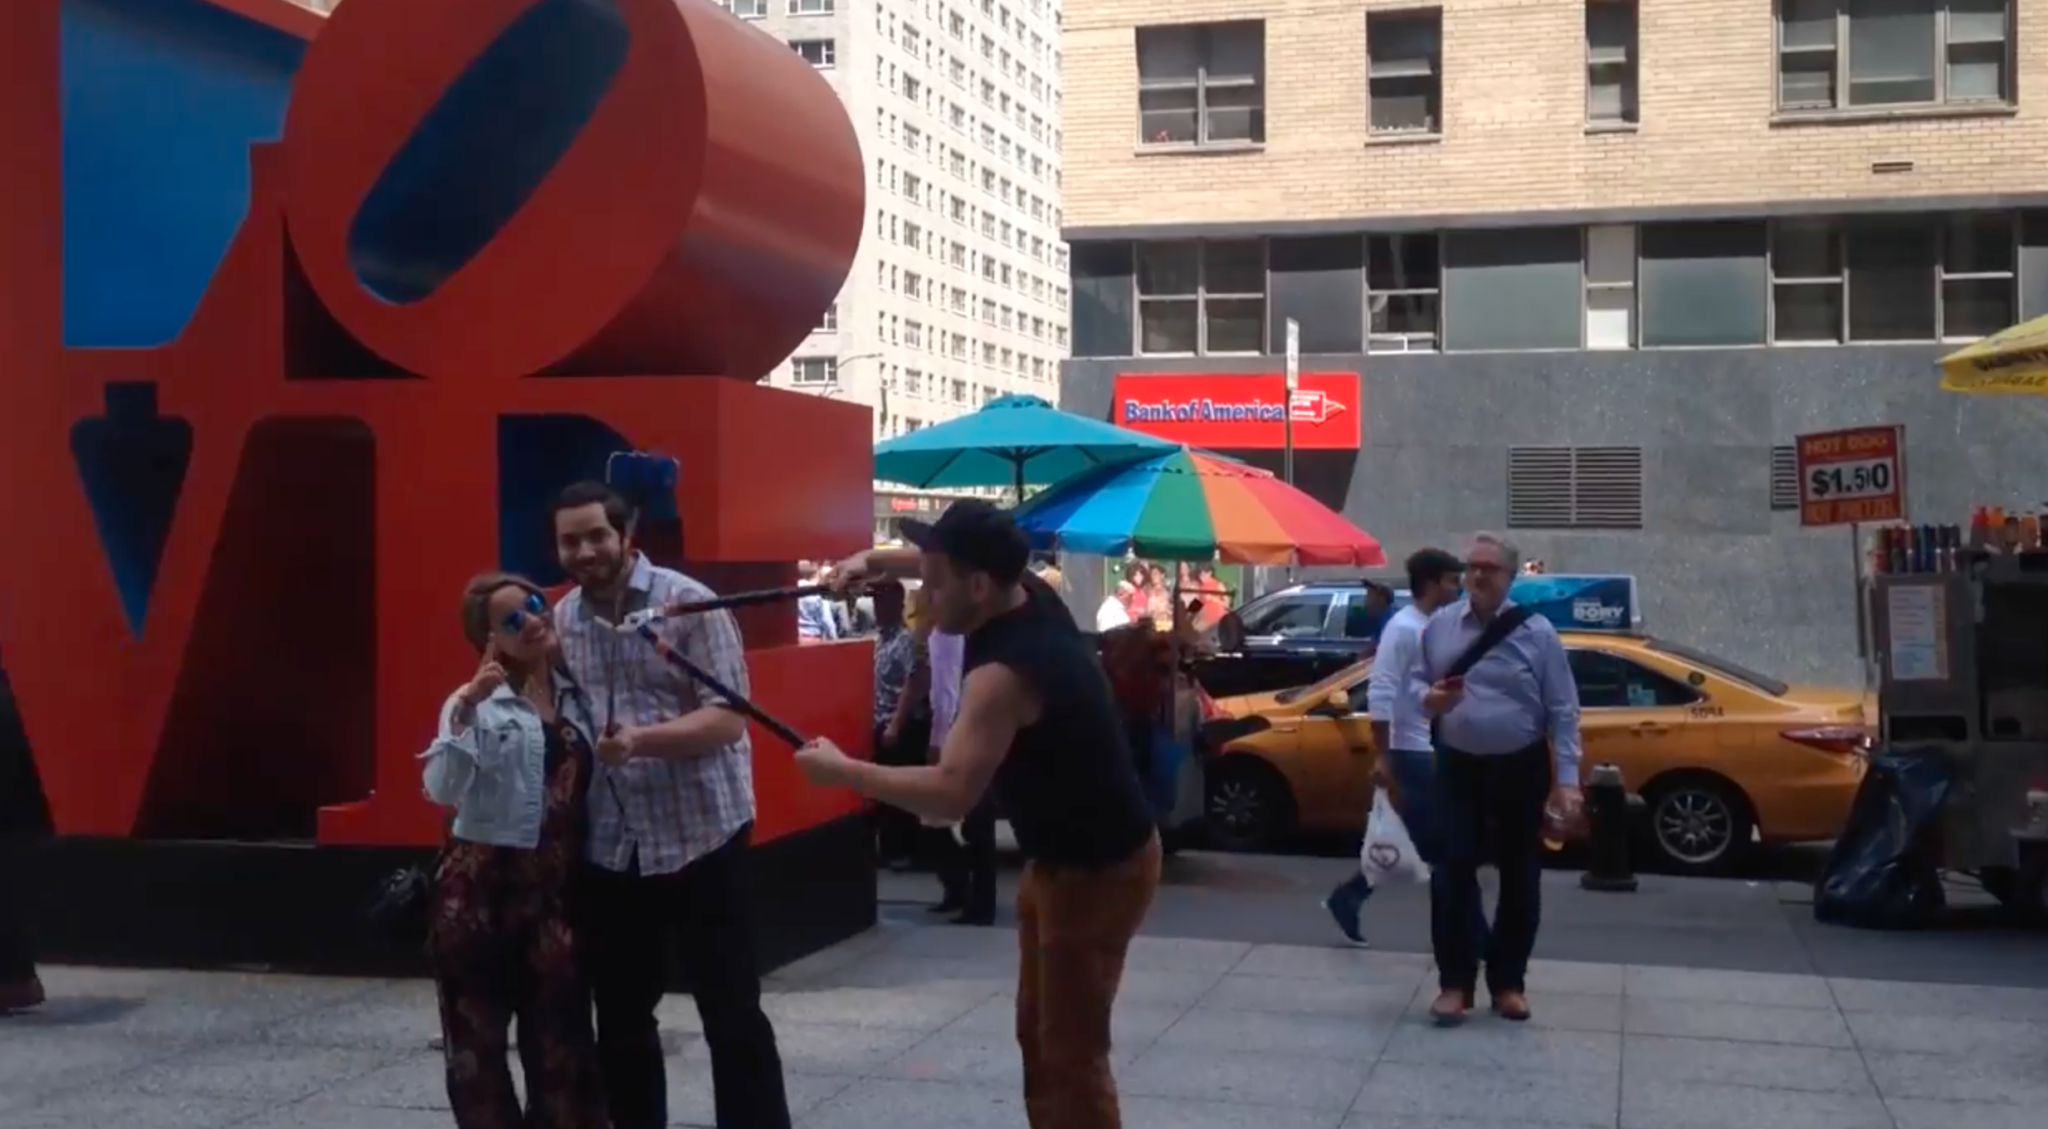 Unmasked Vigilante Patrols NYC Snipping Tourists' Selfie Sticks